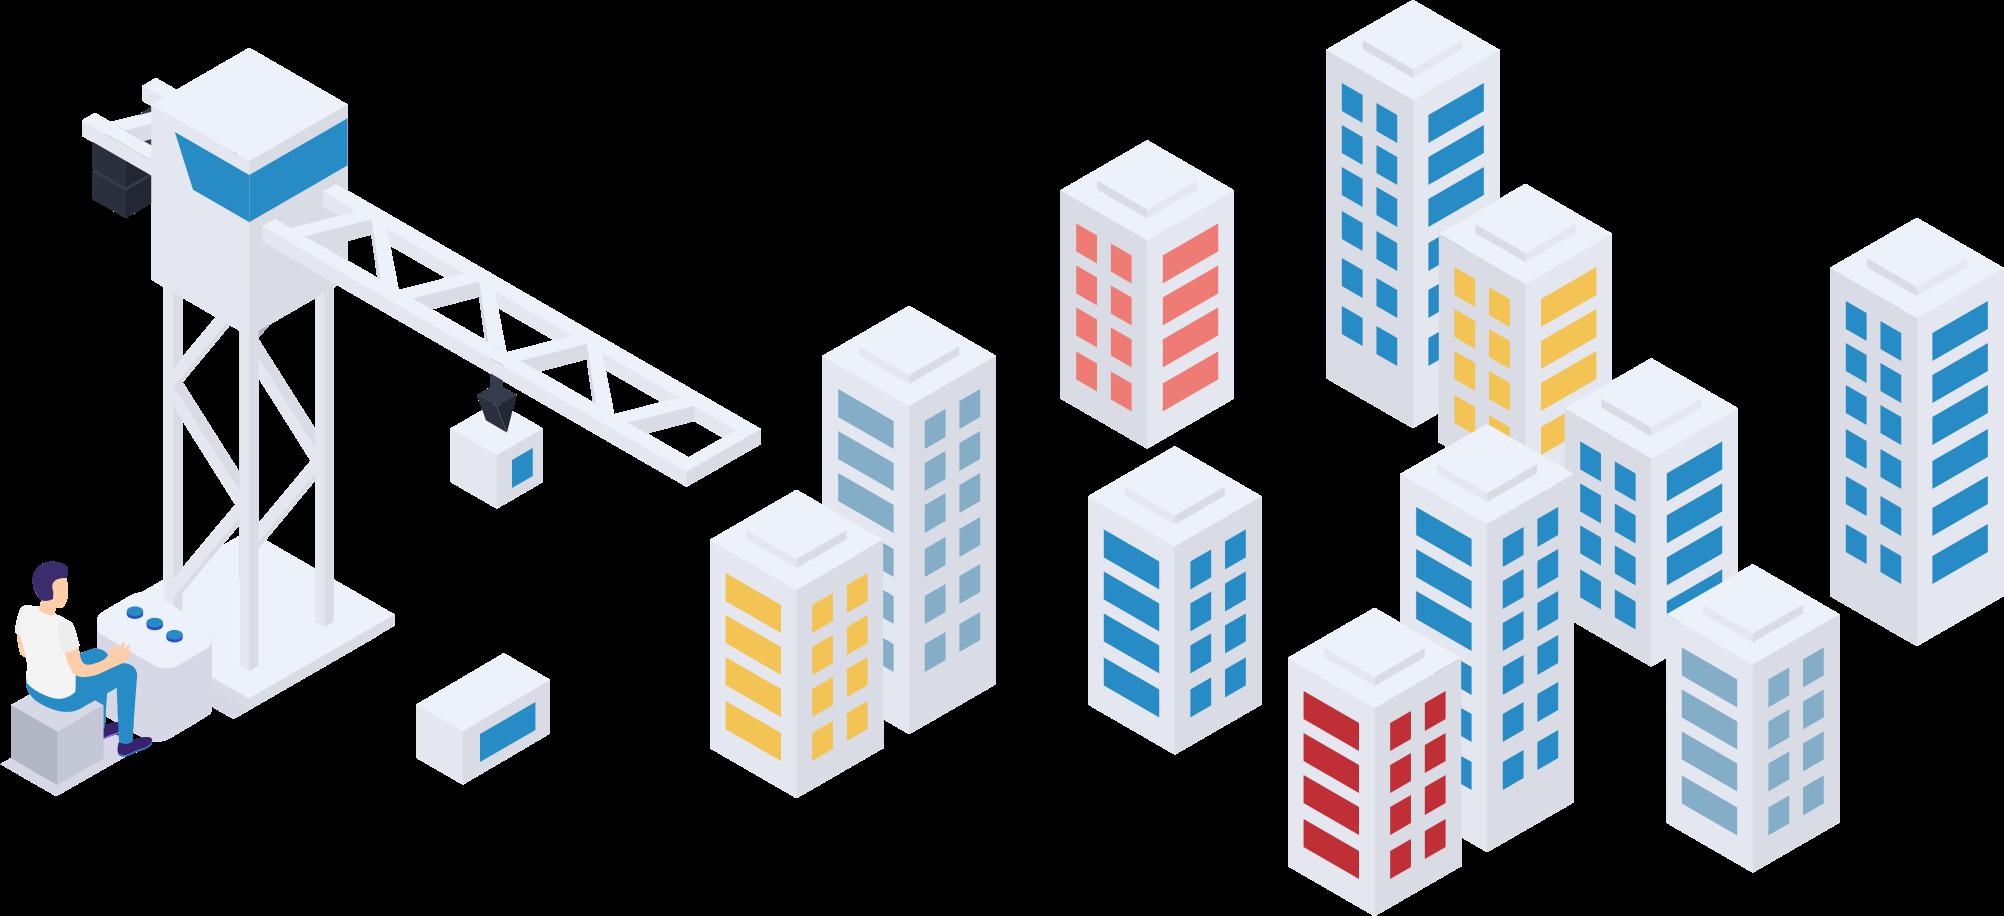 Modular Construction Illustration